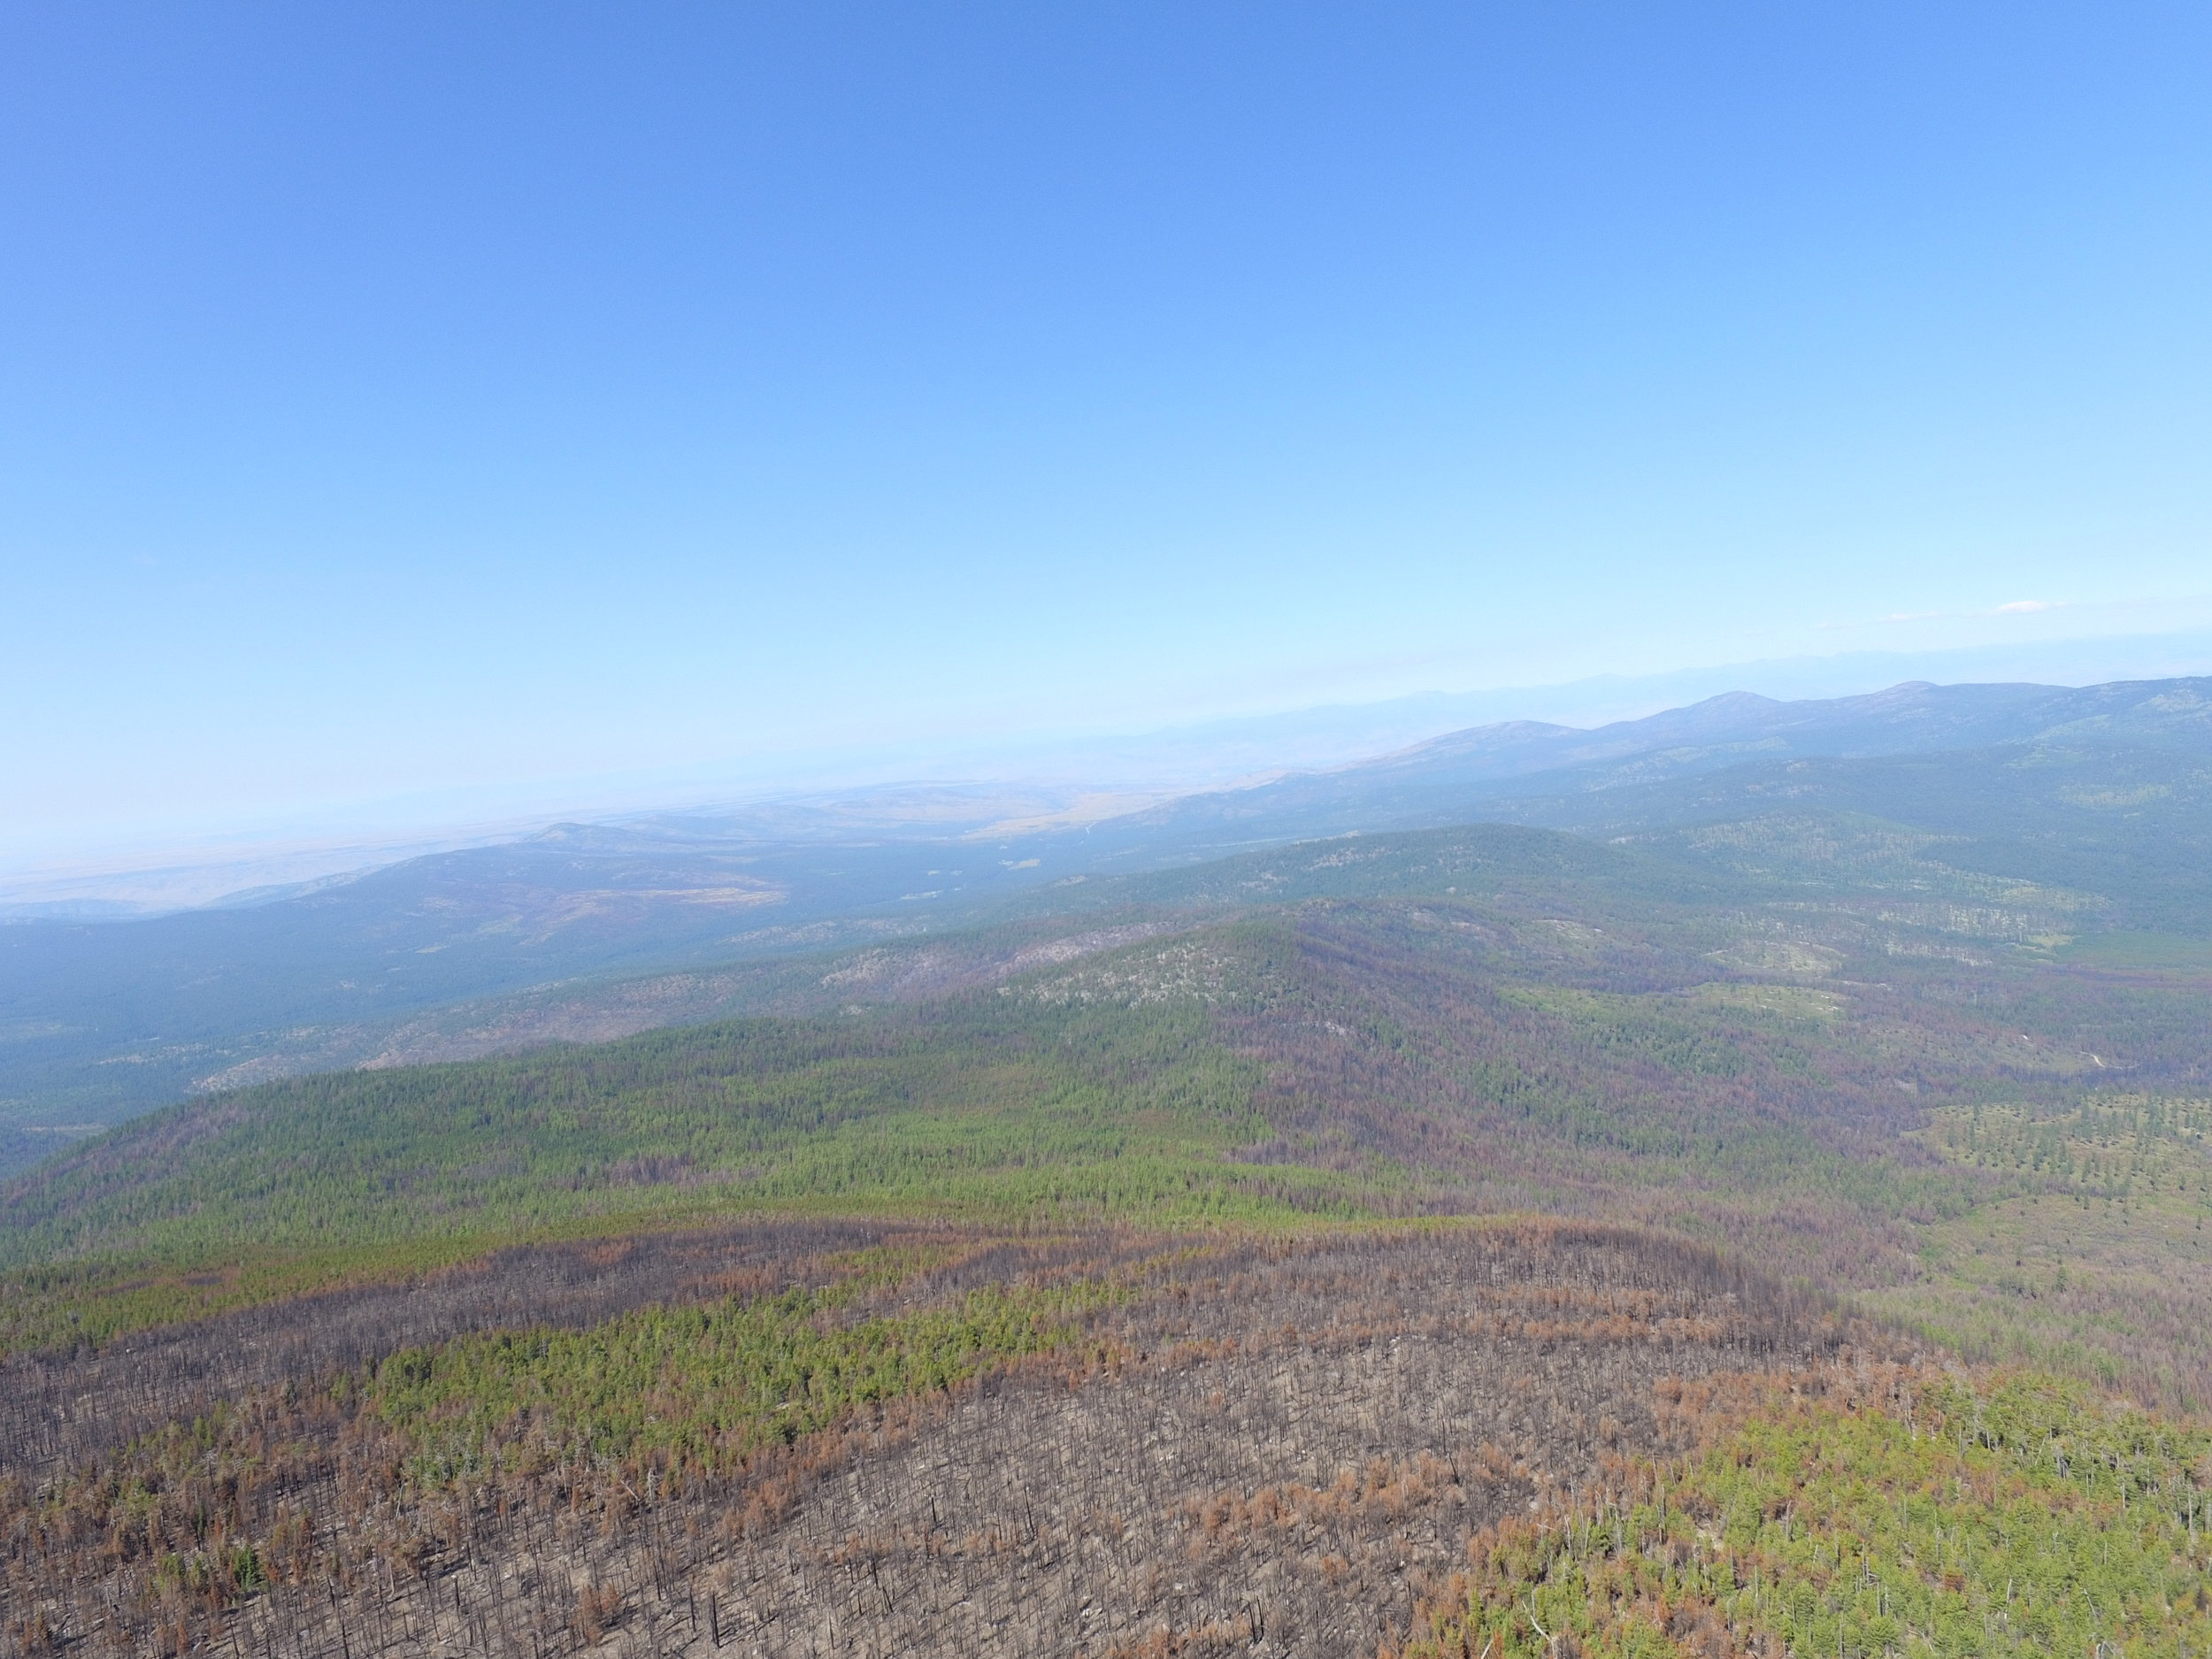 Moses Mt Scenery